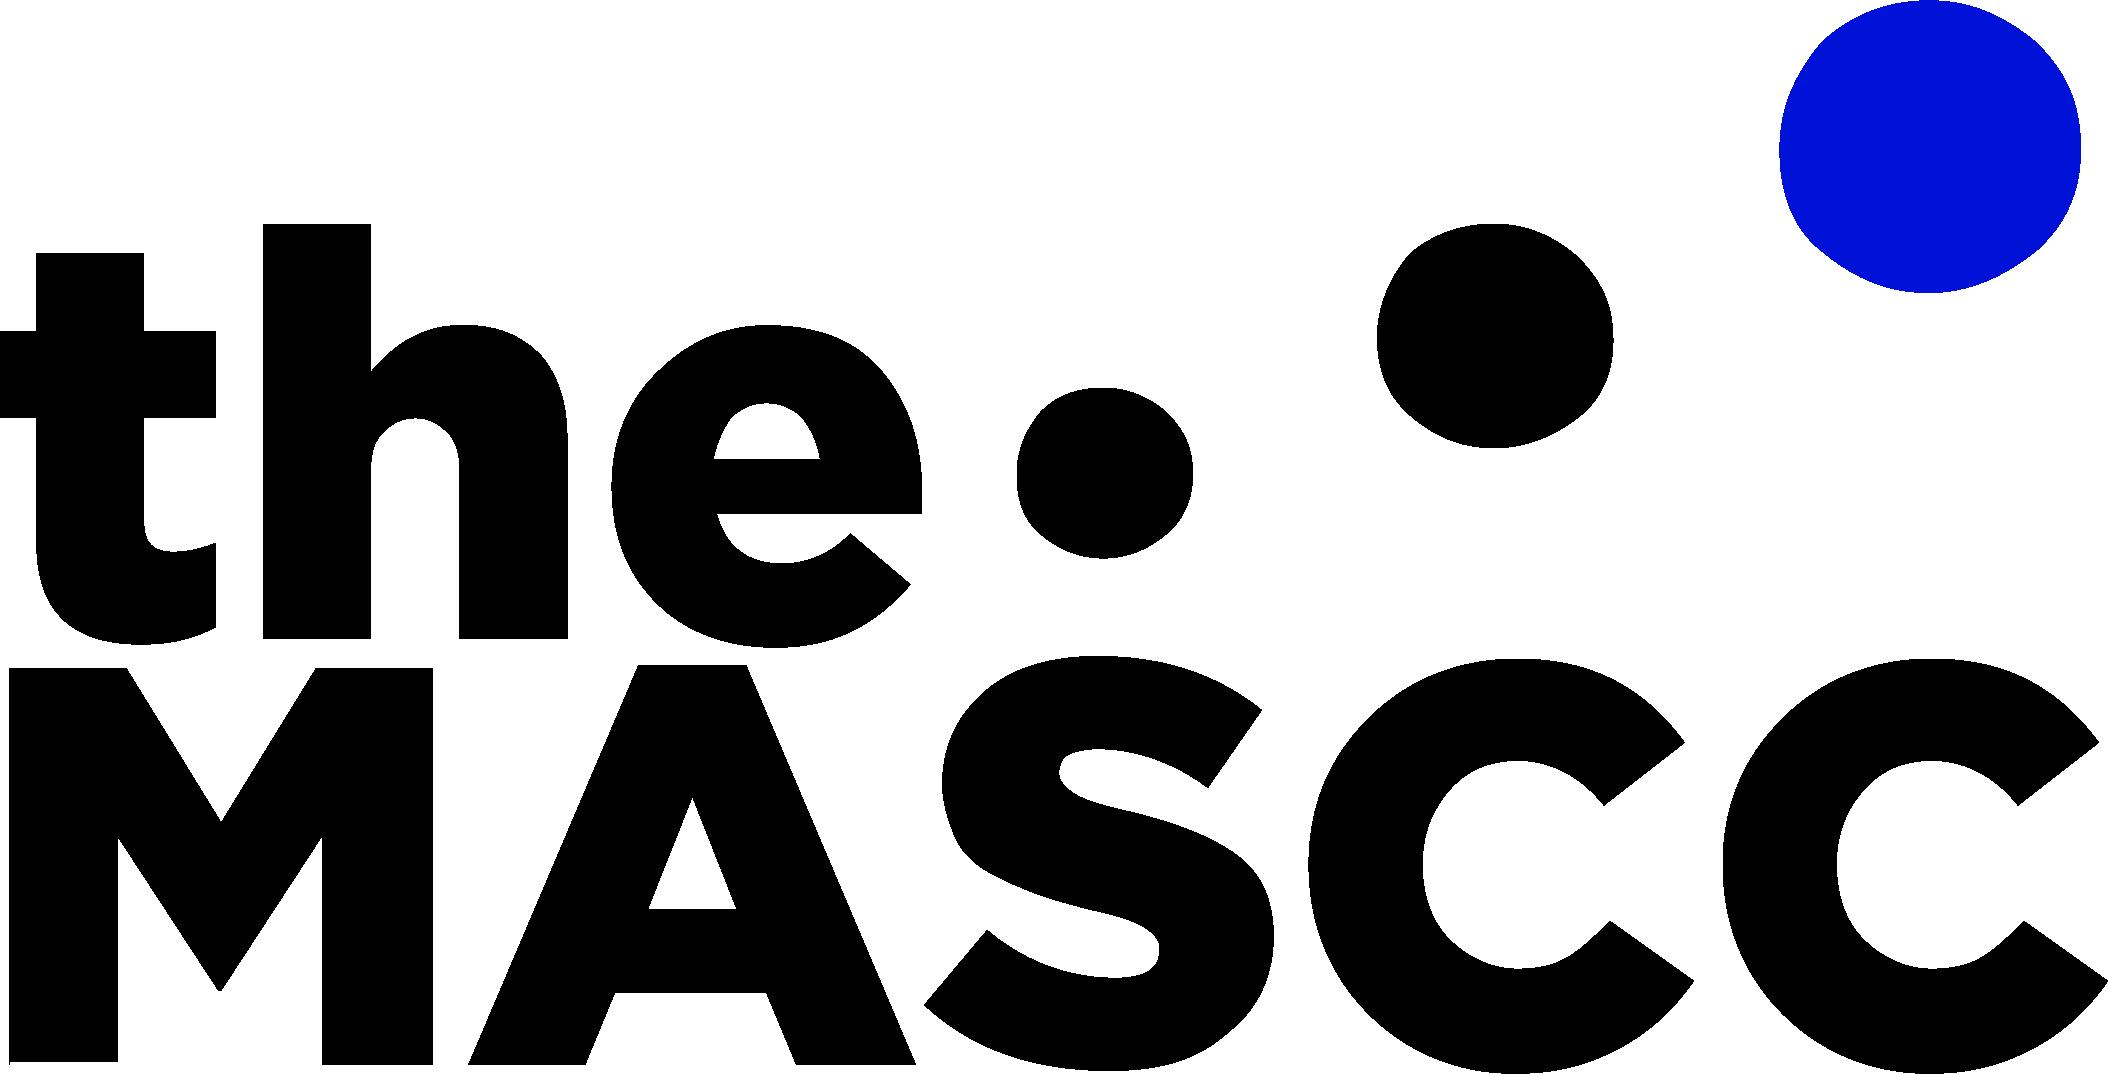 The MASCC Logo